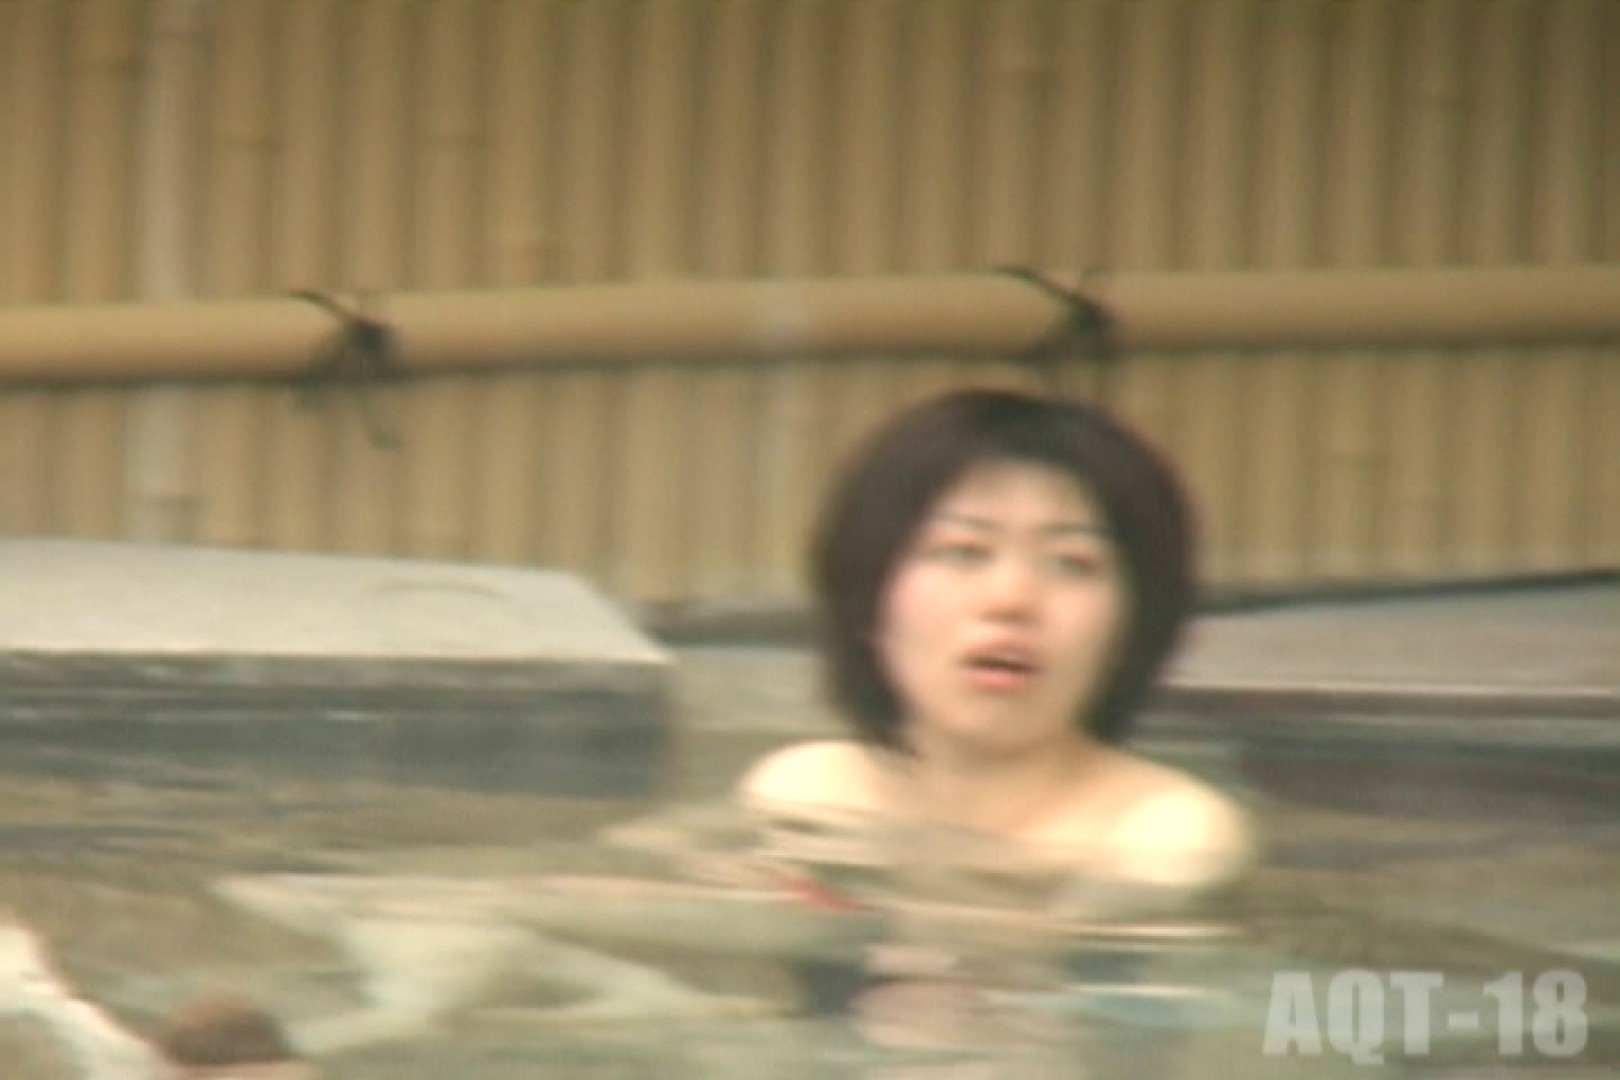 Aquaな露天風呂Vol.861 露天風呂 オメコ無修正動画無料 107連発 29